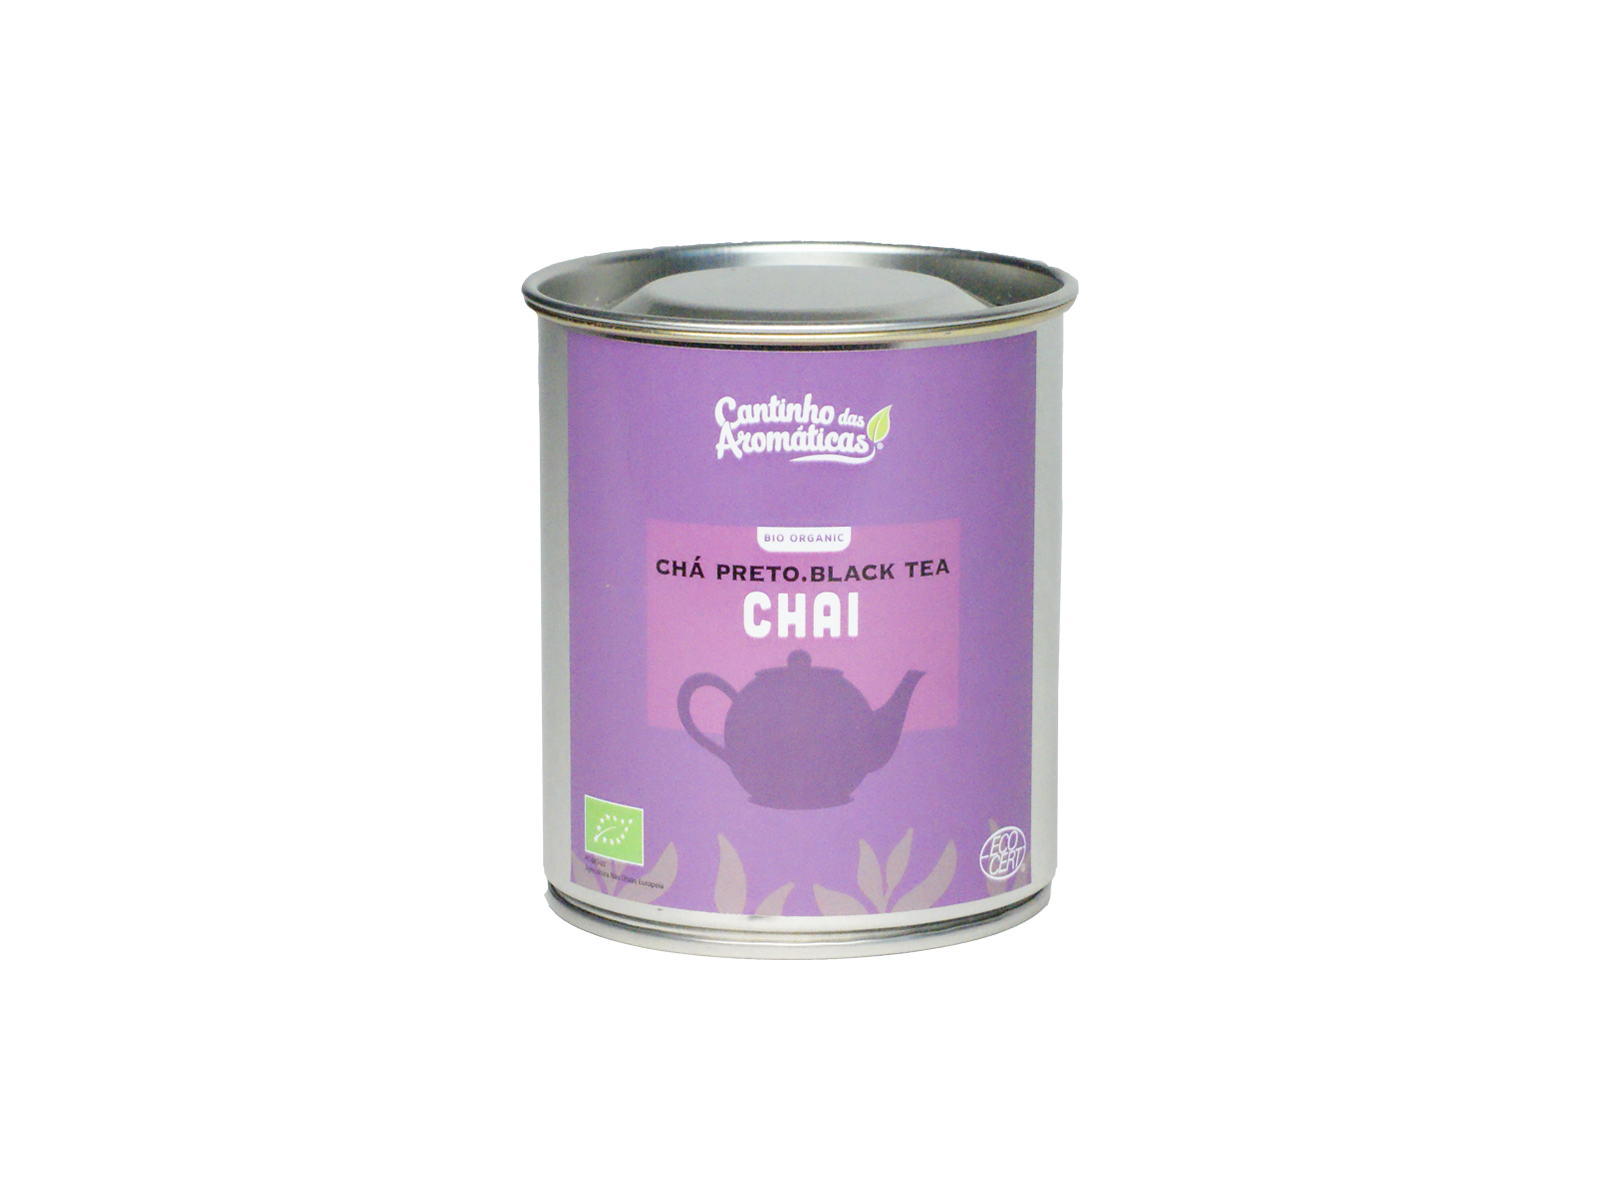 https://www.cantinhodasaromaticas.pt/produto/chai-bio/